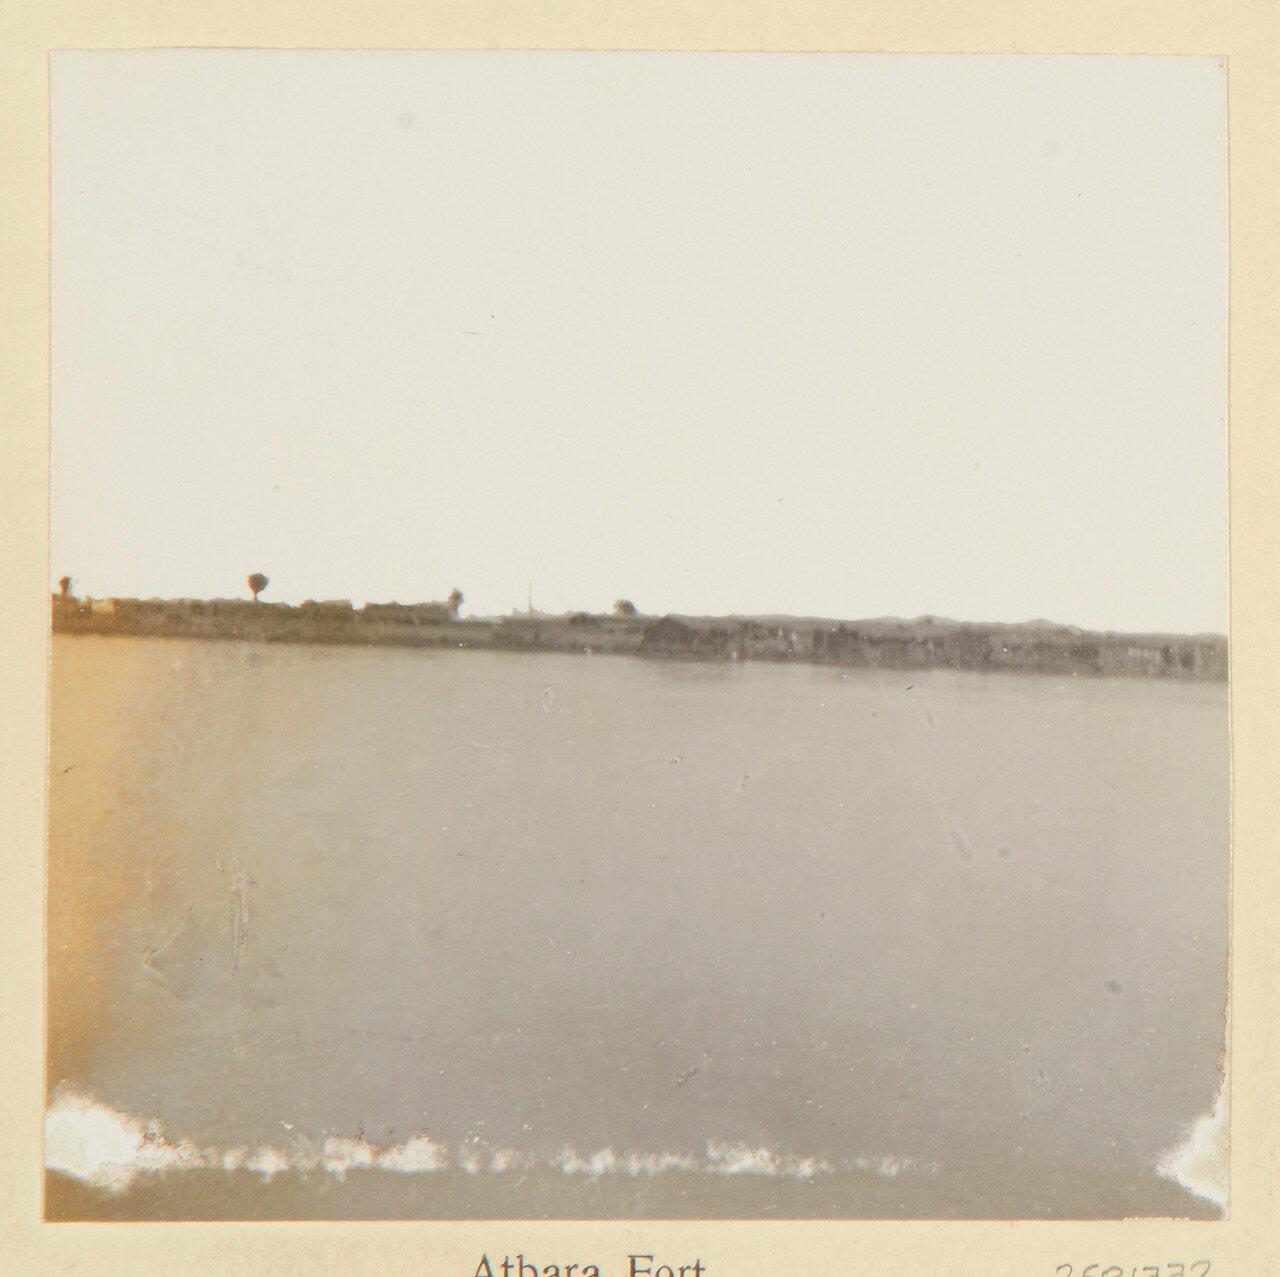 20-25 августа 1898. Форт Атбара